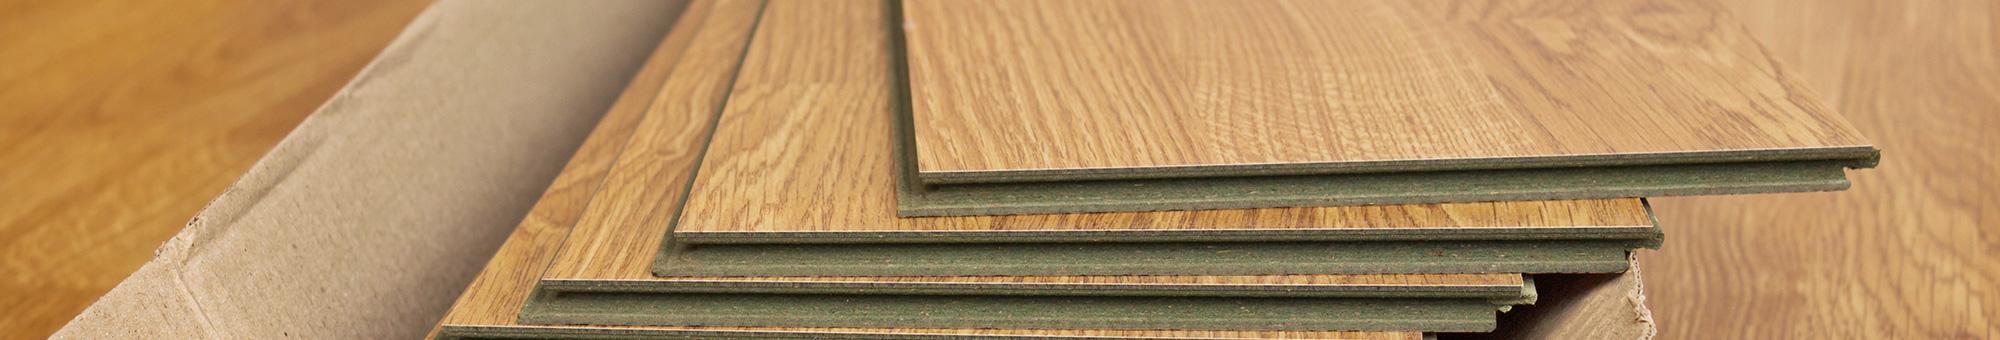 Flooring installation hardwood flooring johnson city tn for Tennessee hardwood flooring